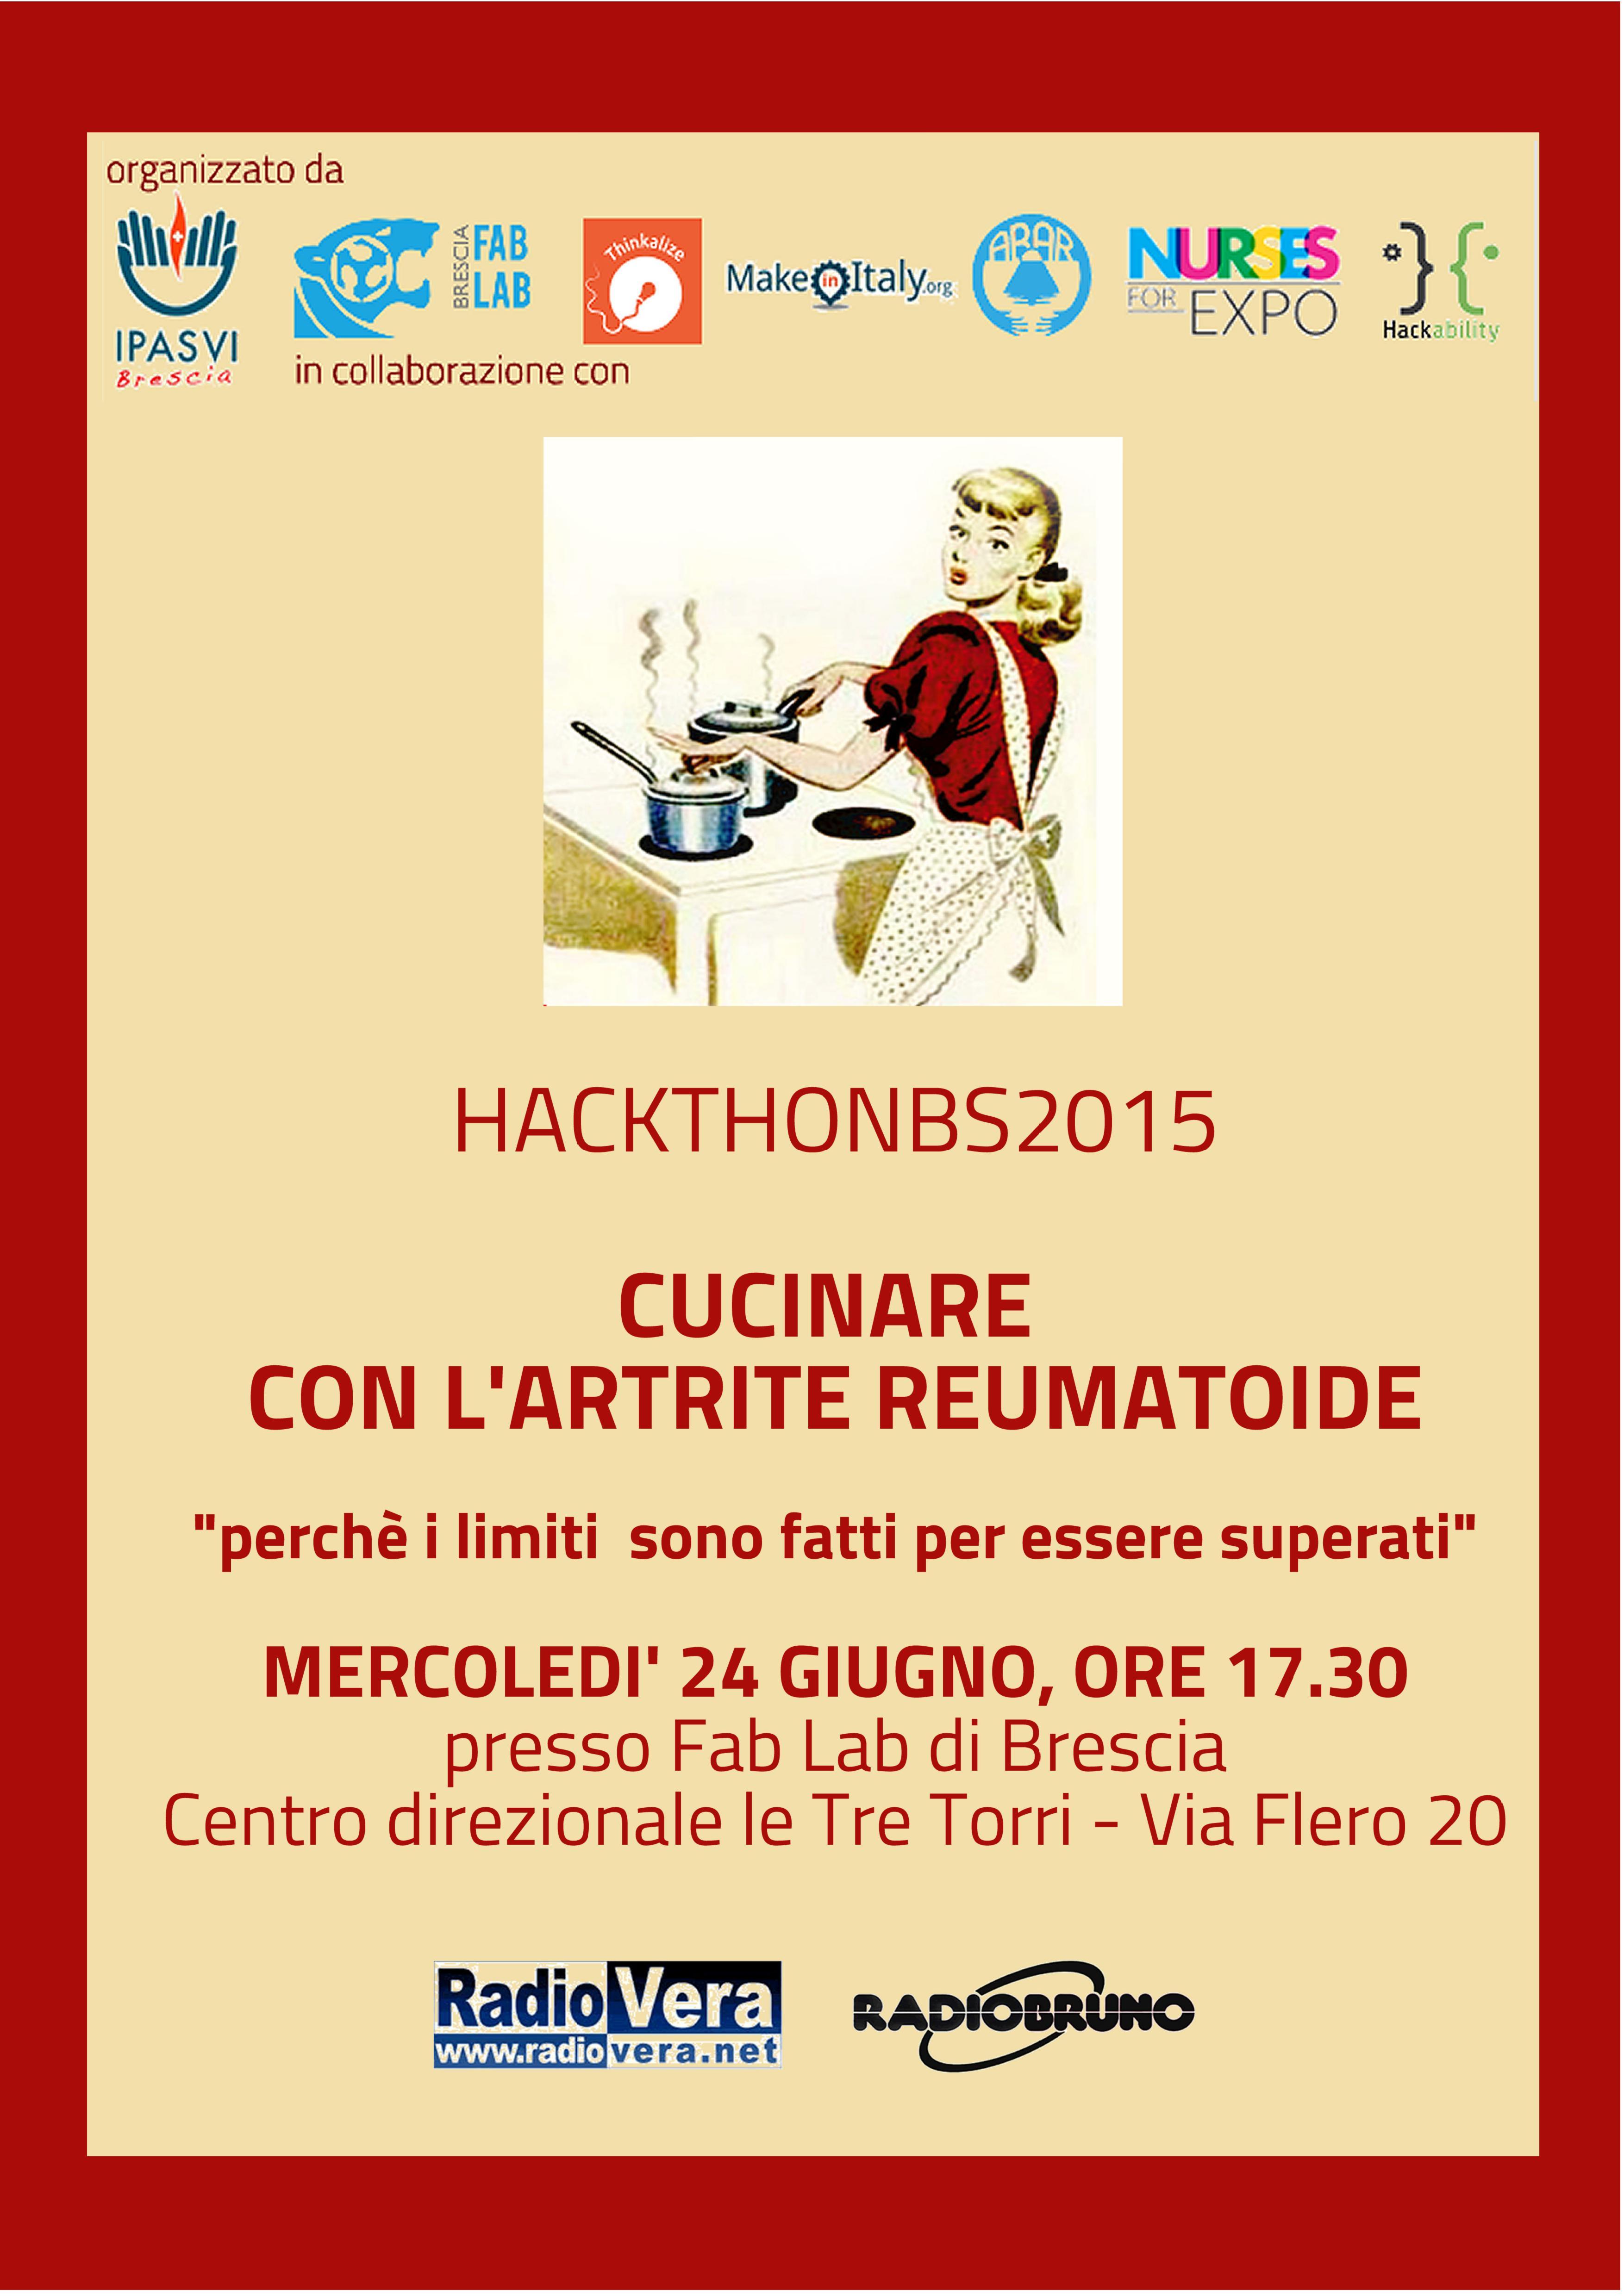 hackathonbs 2015